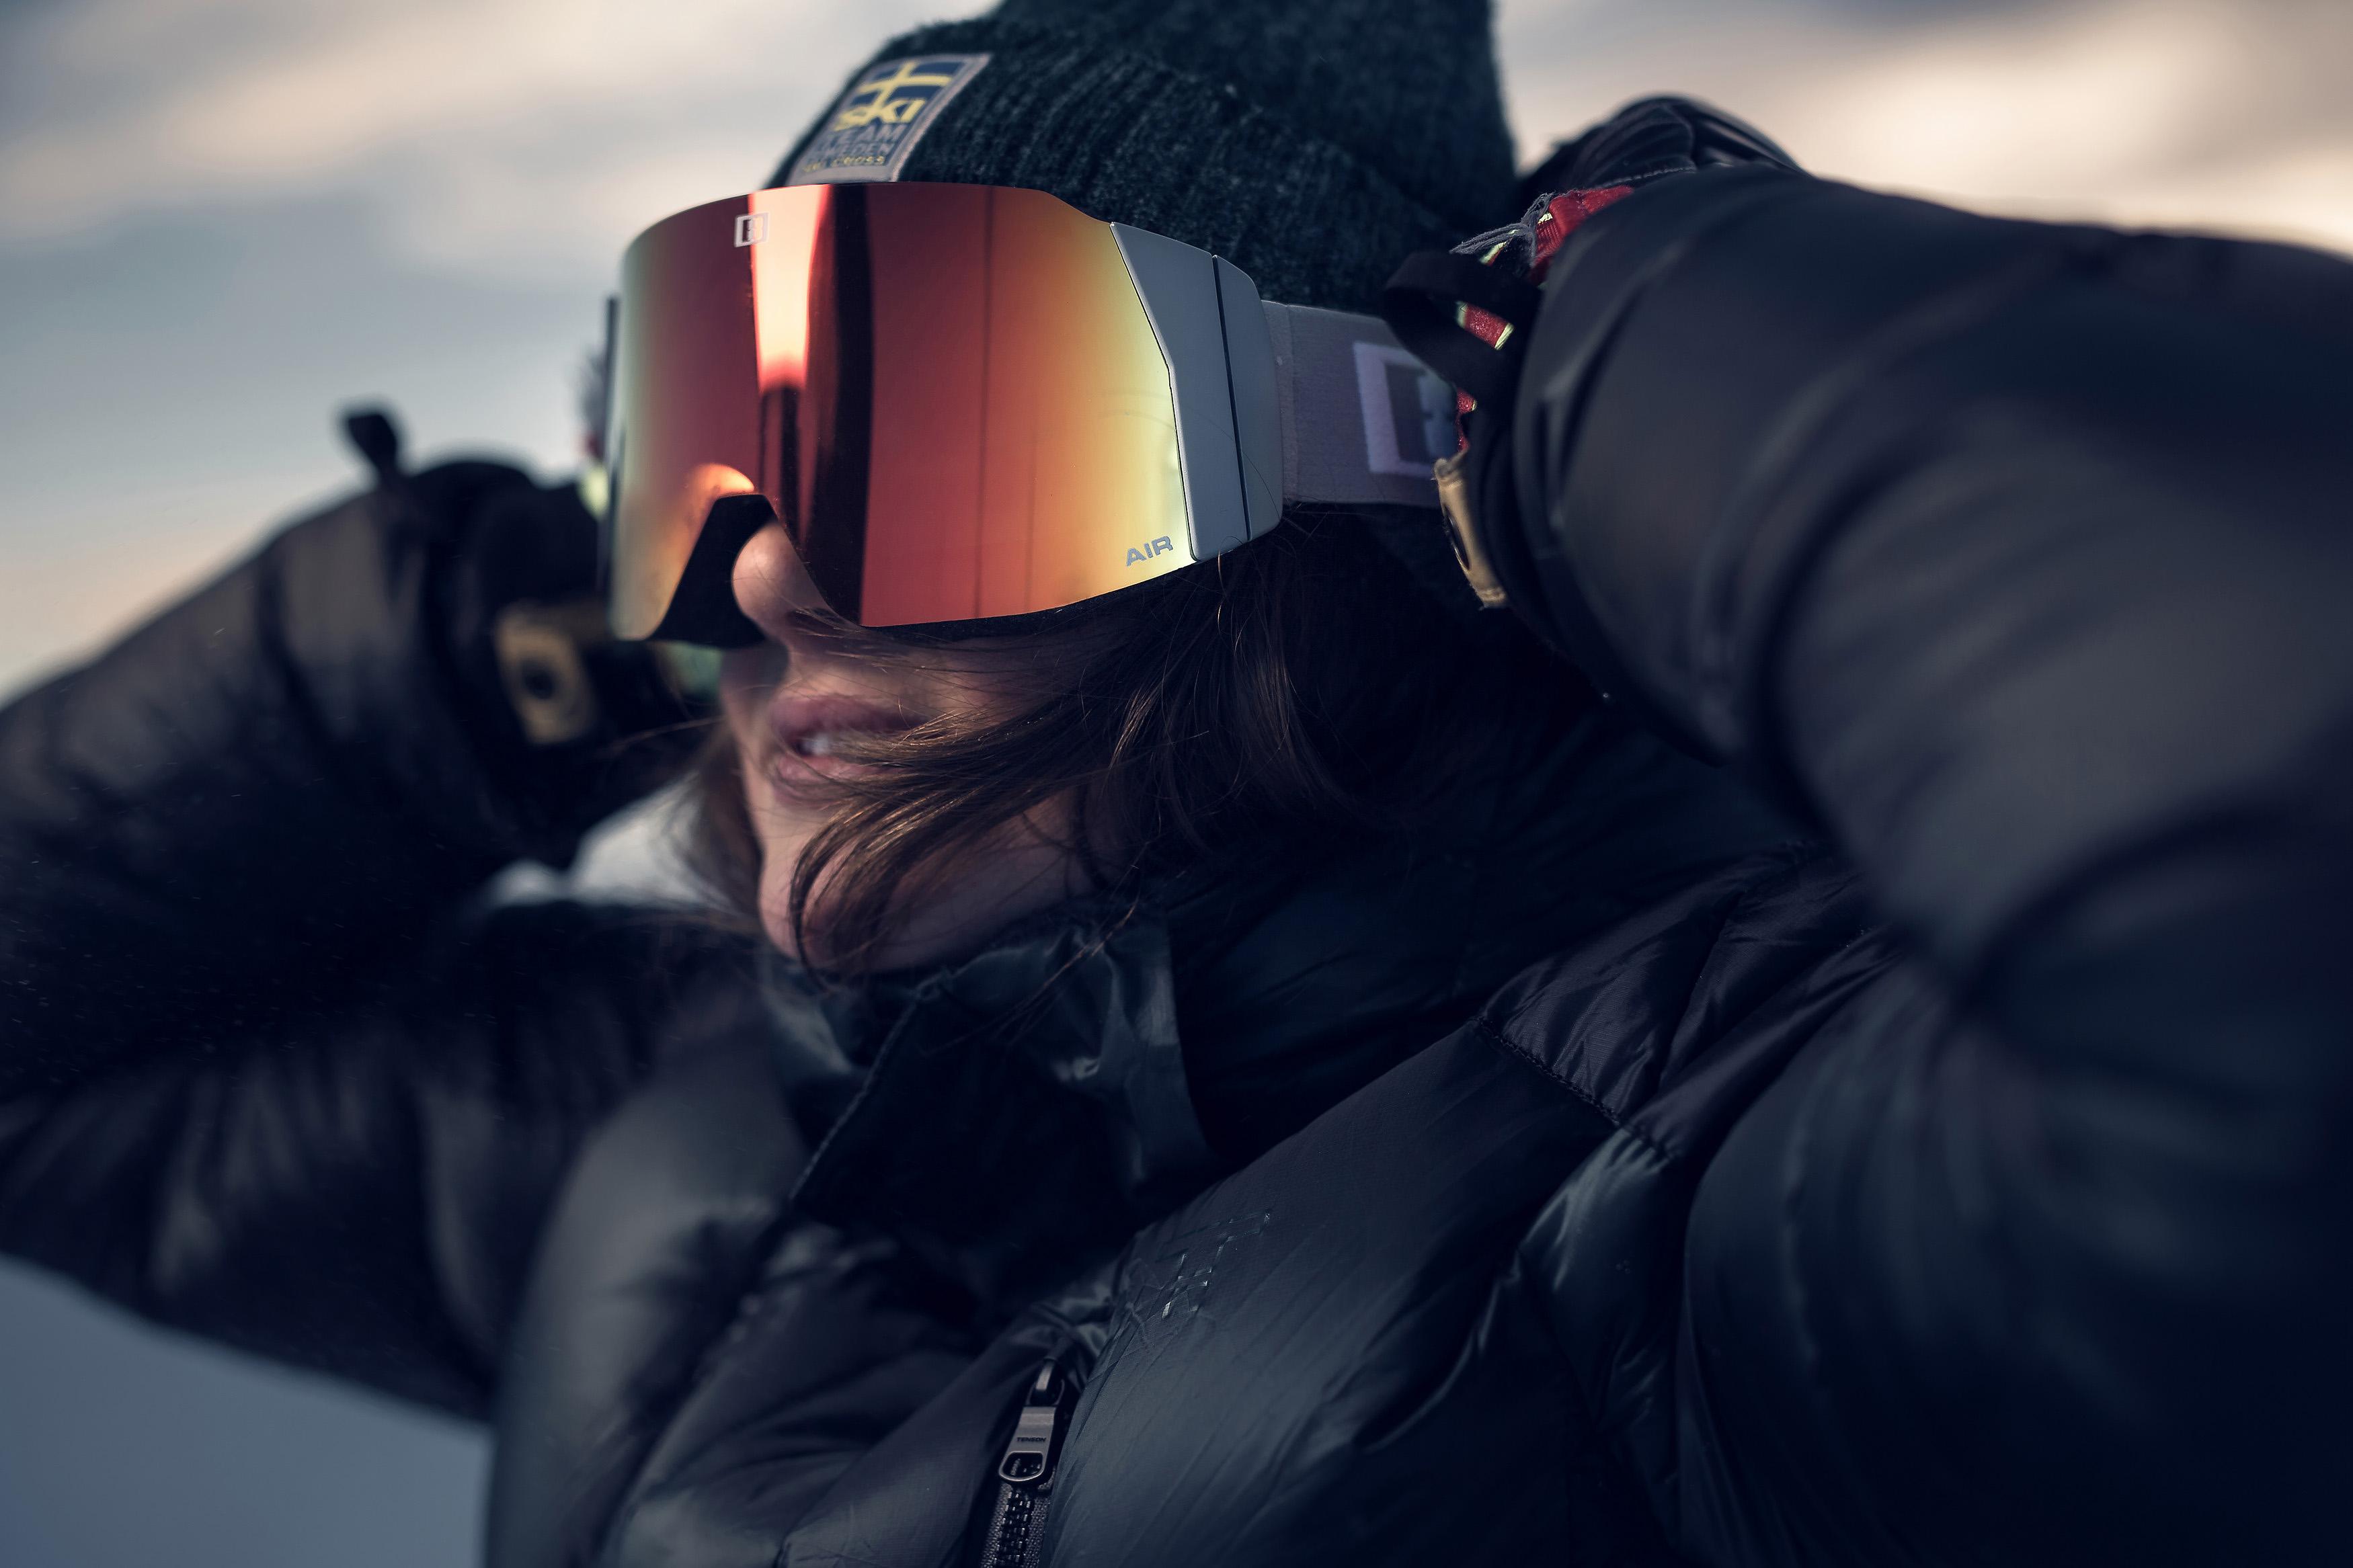 38097-84-air-bliz-ski-goggles-white-skicross-goggles-alexandra-edebo-lifestyle2.jpg